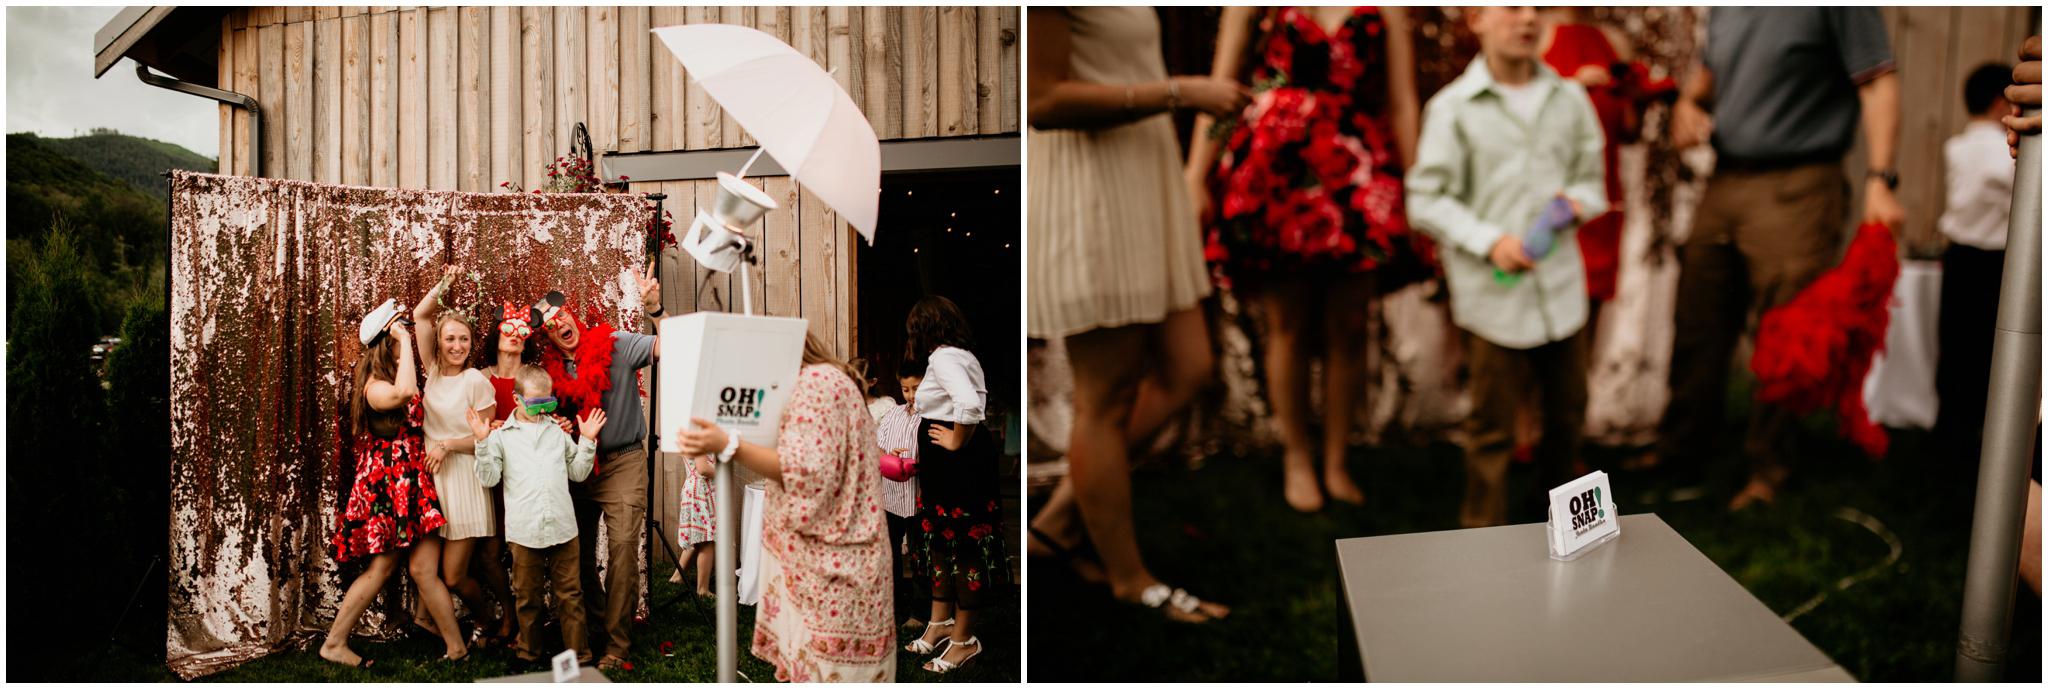 alex-and-matthew-three-cs-farm-venue-seattle-wedding-photographer-152.jpg